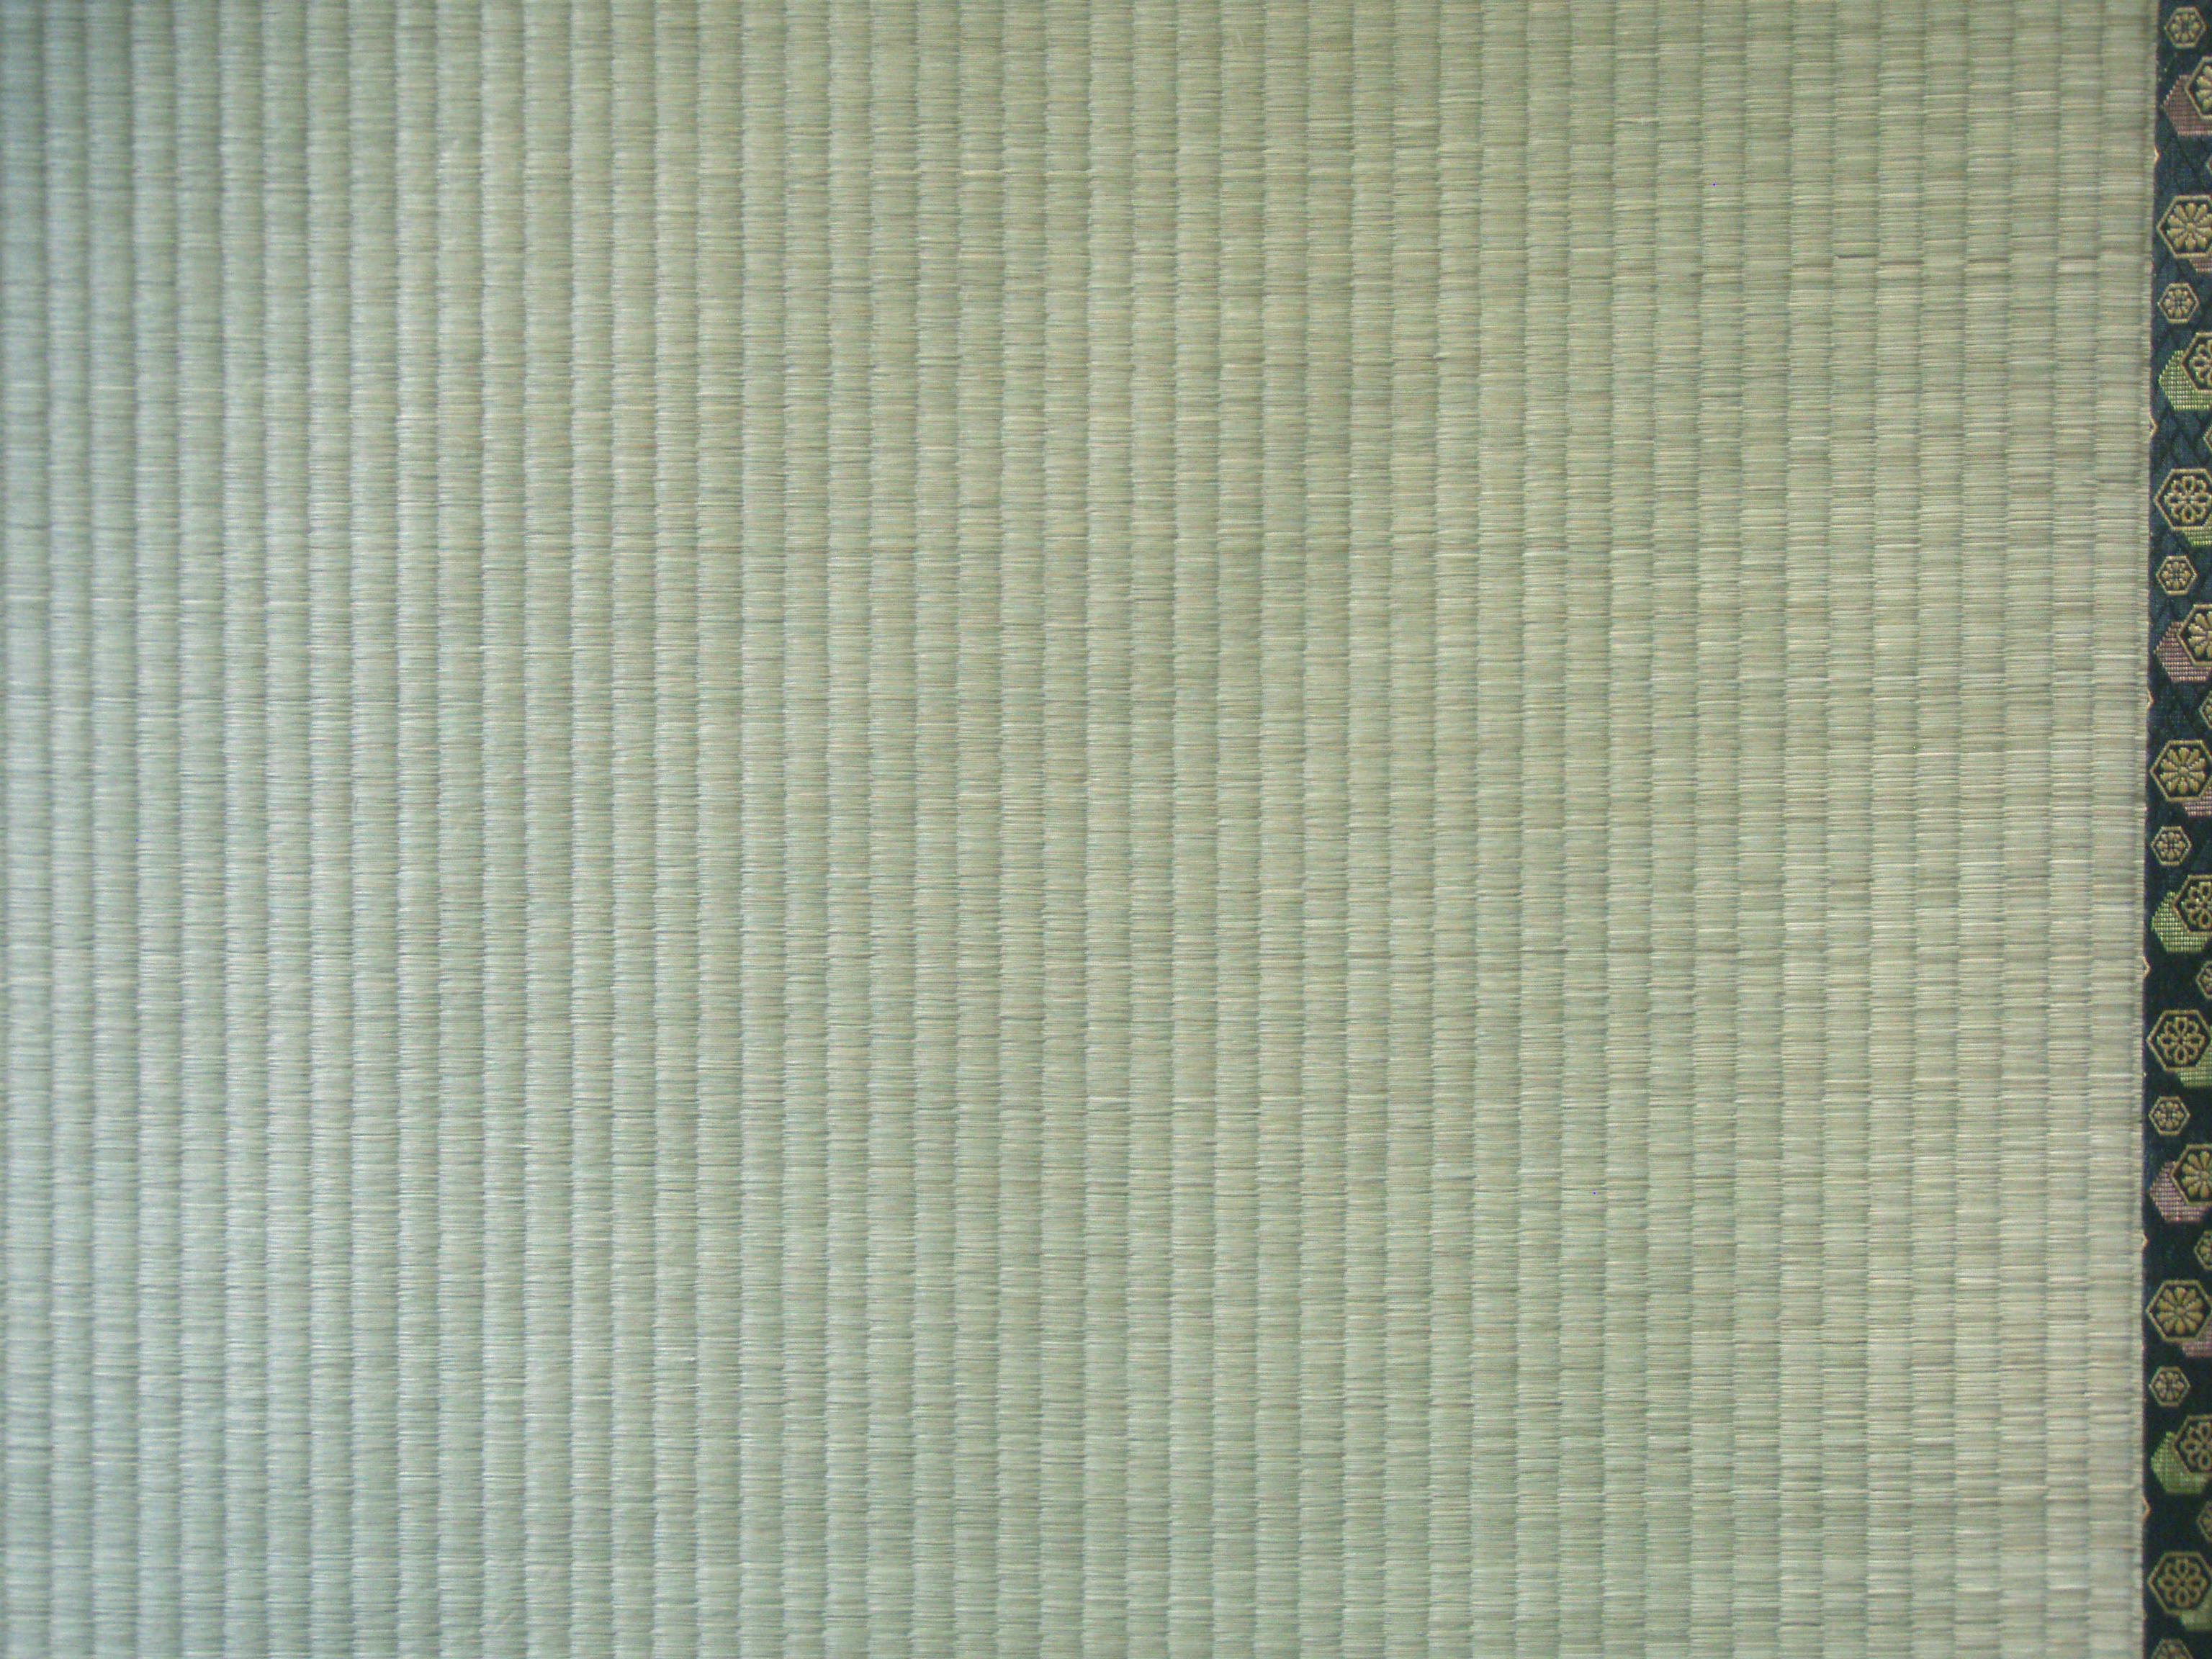 Mellow Monk S Green Tea Blog A Tatami Mat For Your Desktop